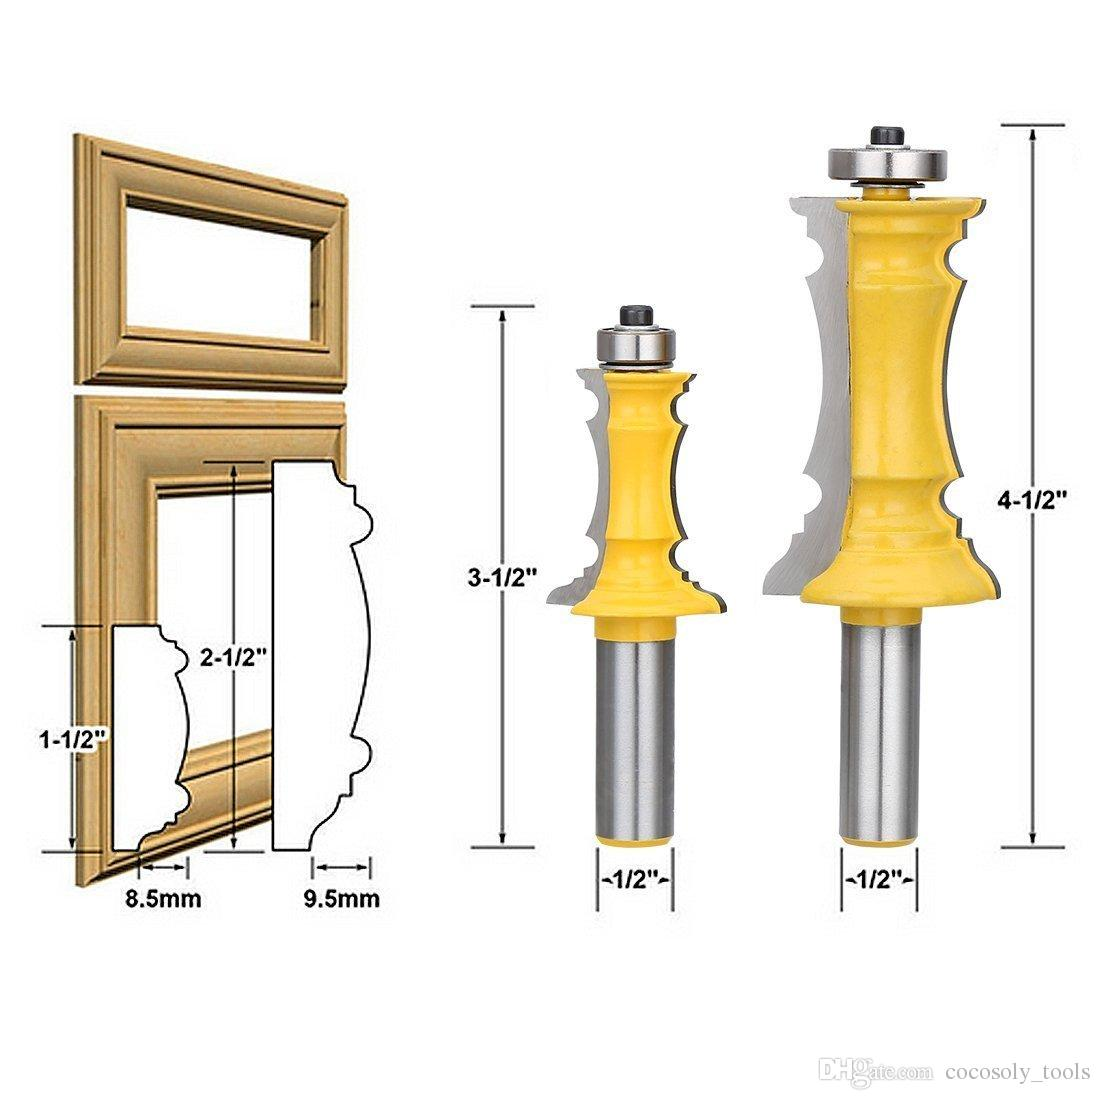 "Woodworking Milling Cutter Router Bit Set 1/2"" Shank Mitered Door & Drawer Panel Molding Router Bit Set"